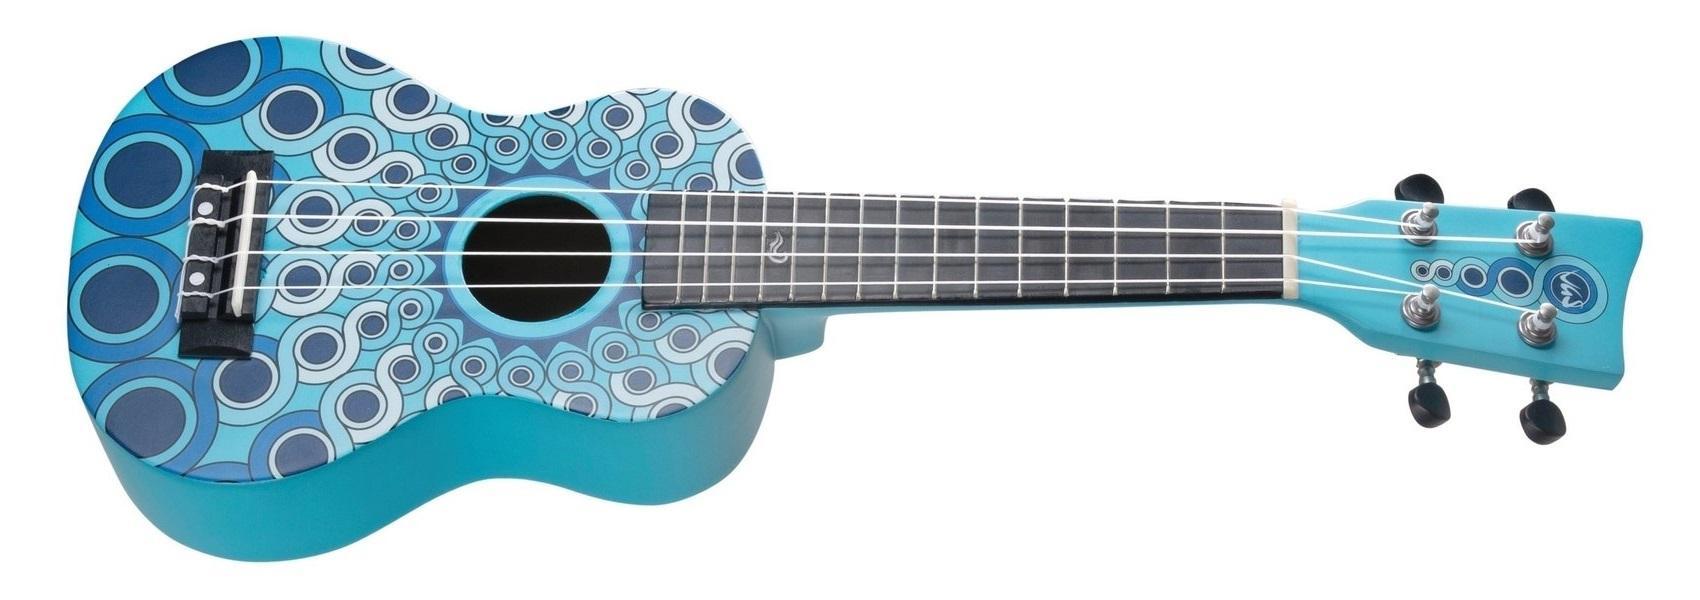 Manoa-Ukulele W-SO-MG Blau